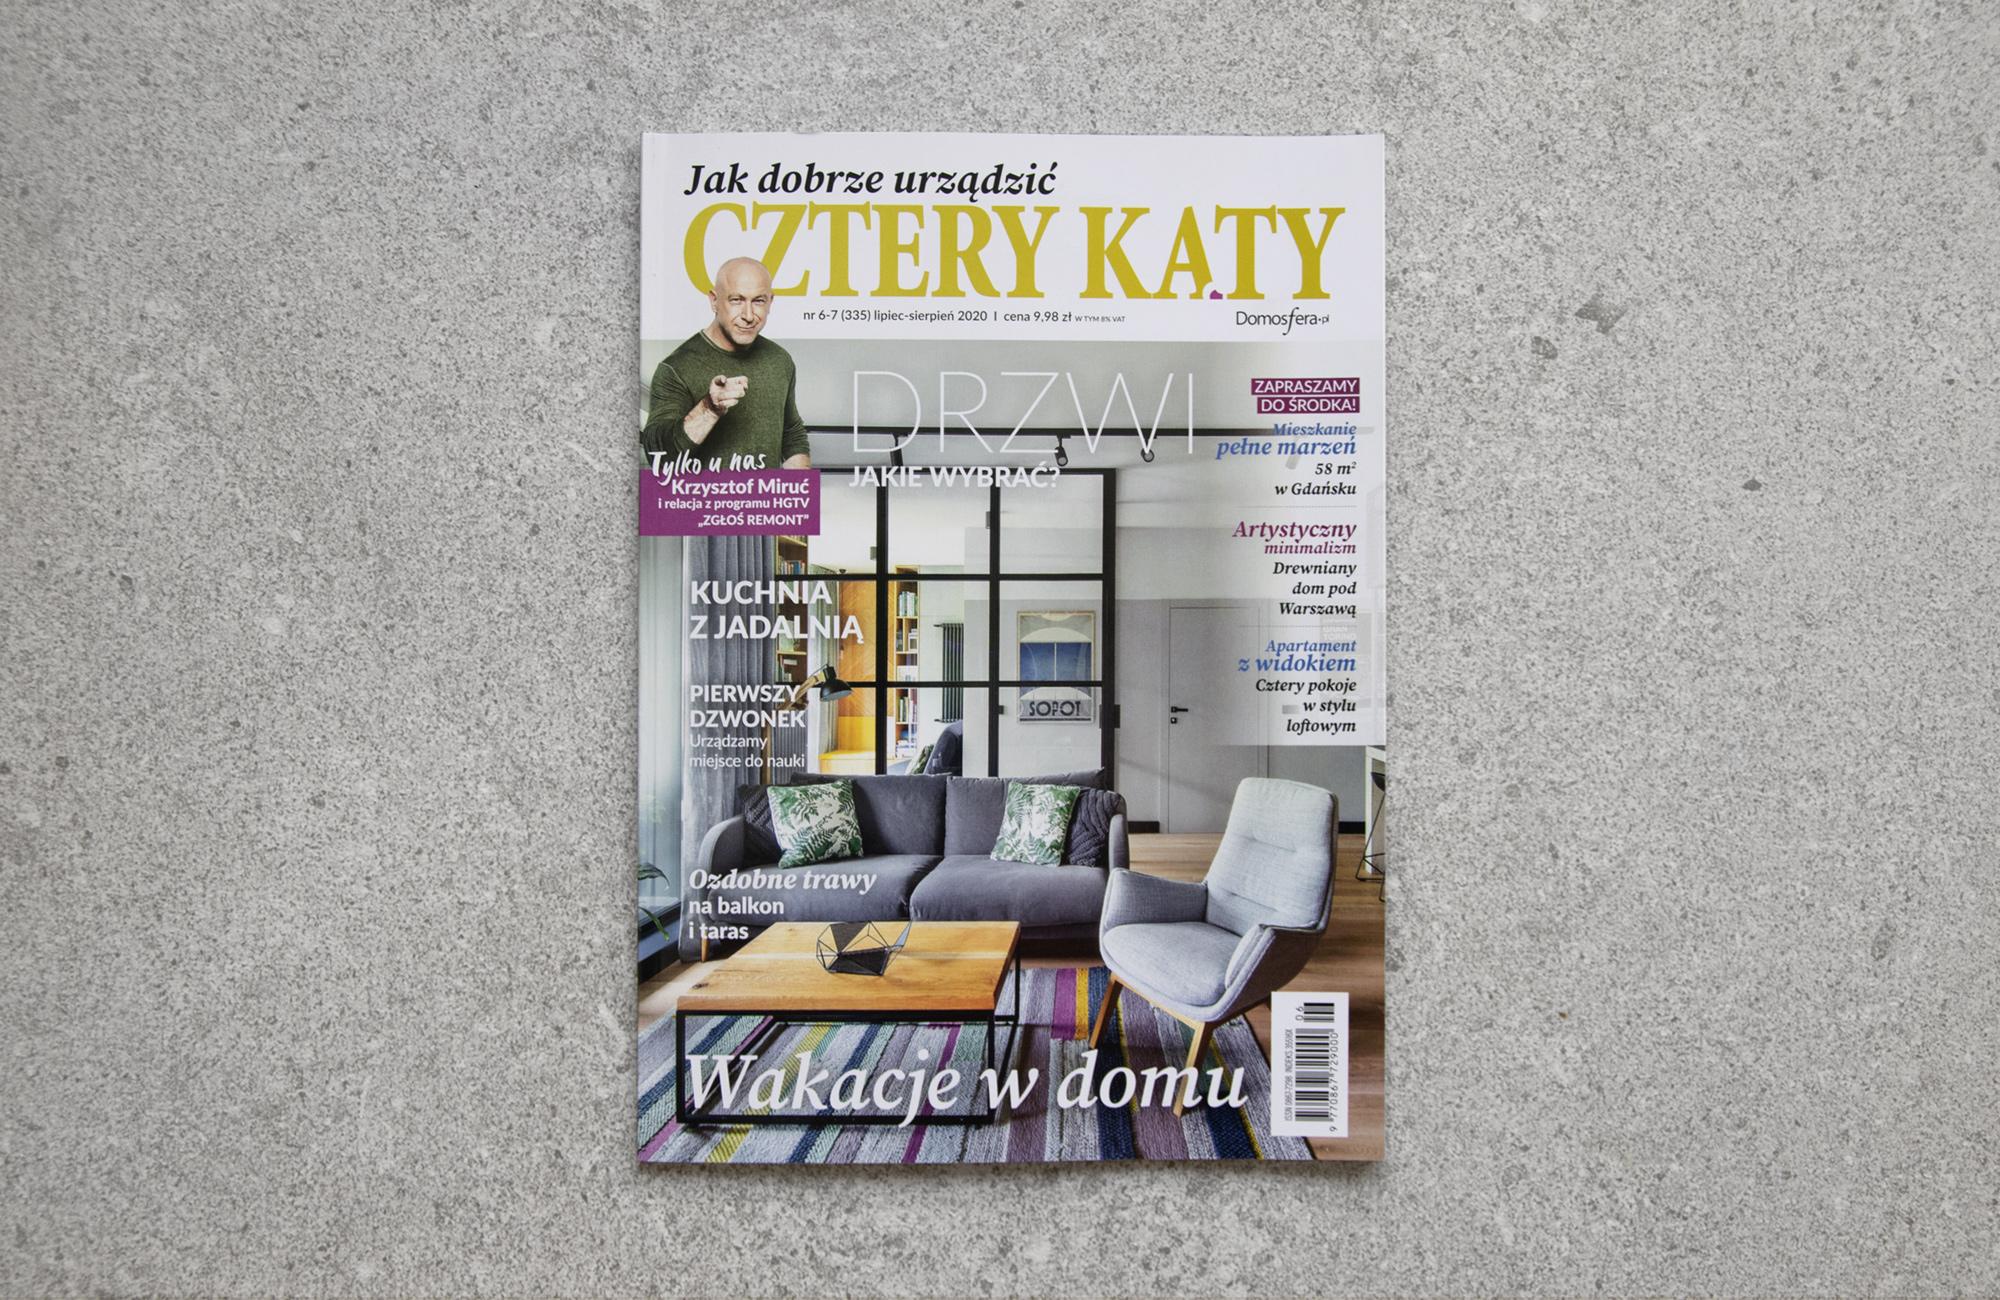 Publication of Quarta project in Cztery Katy